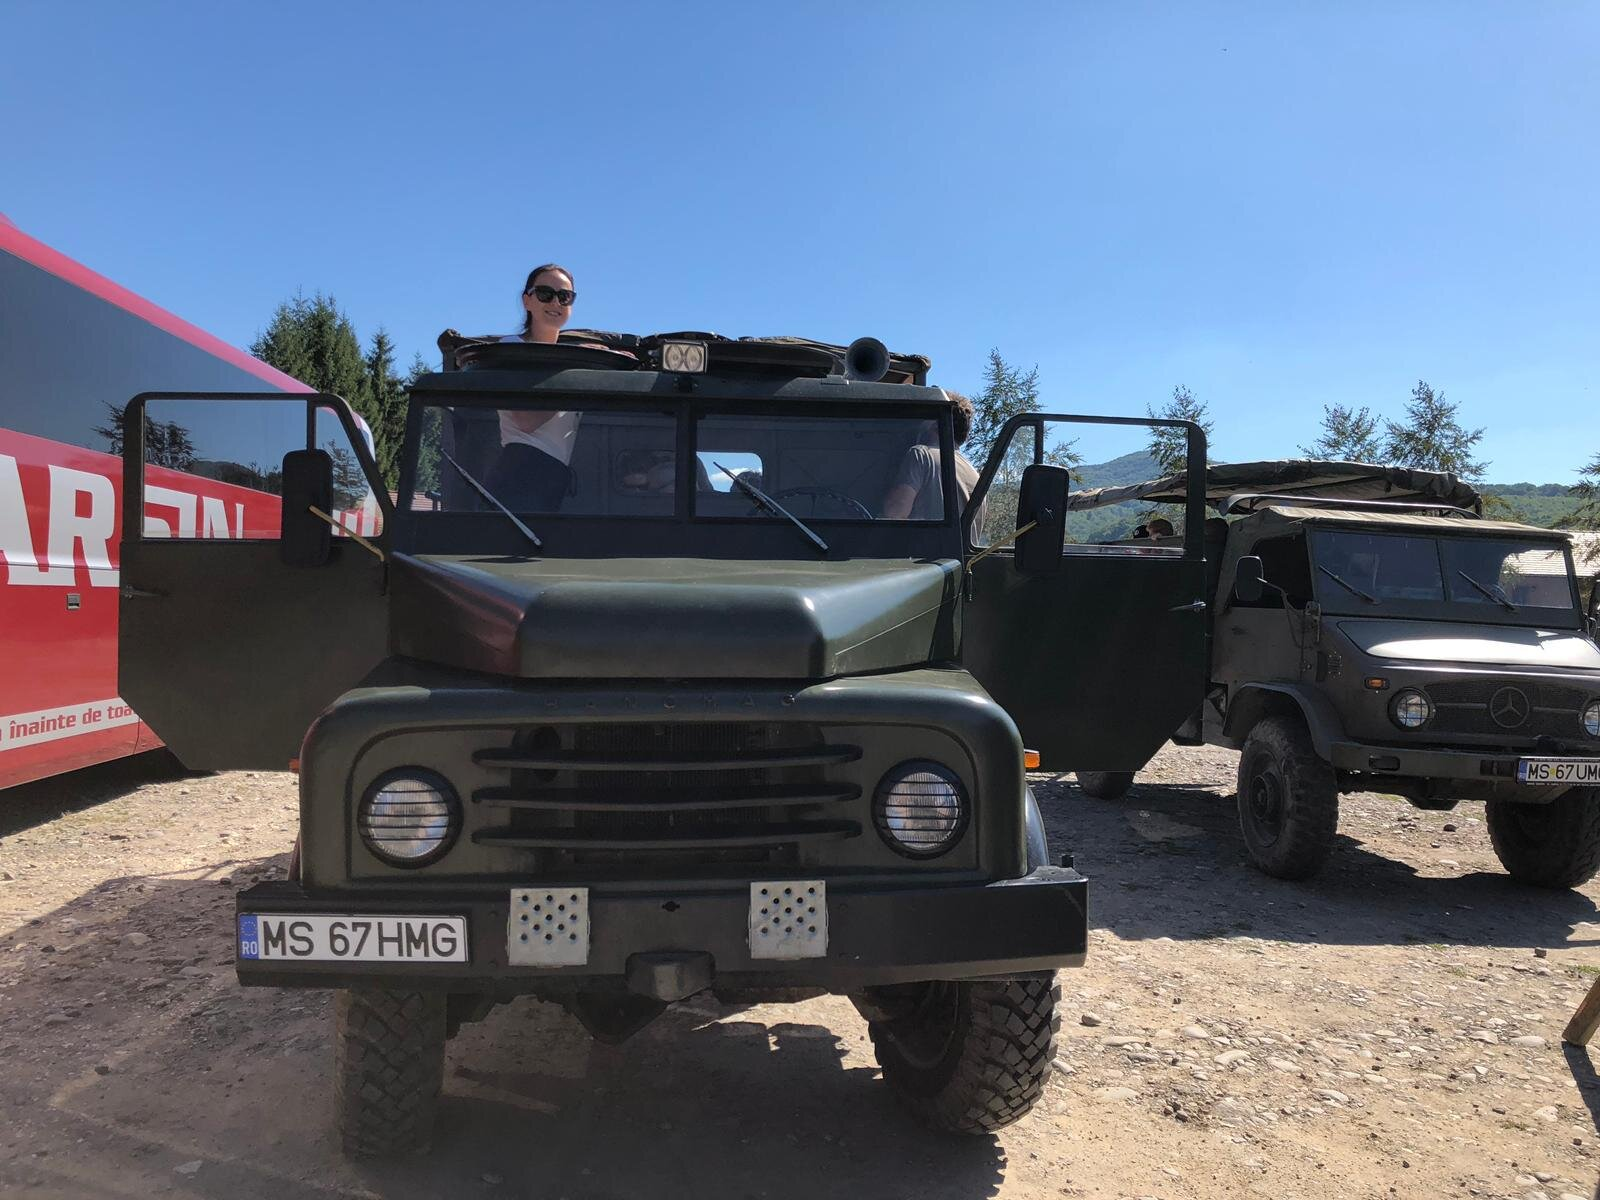 Romanian Safari